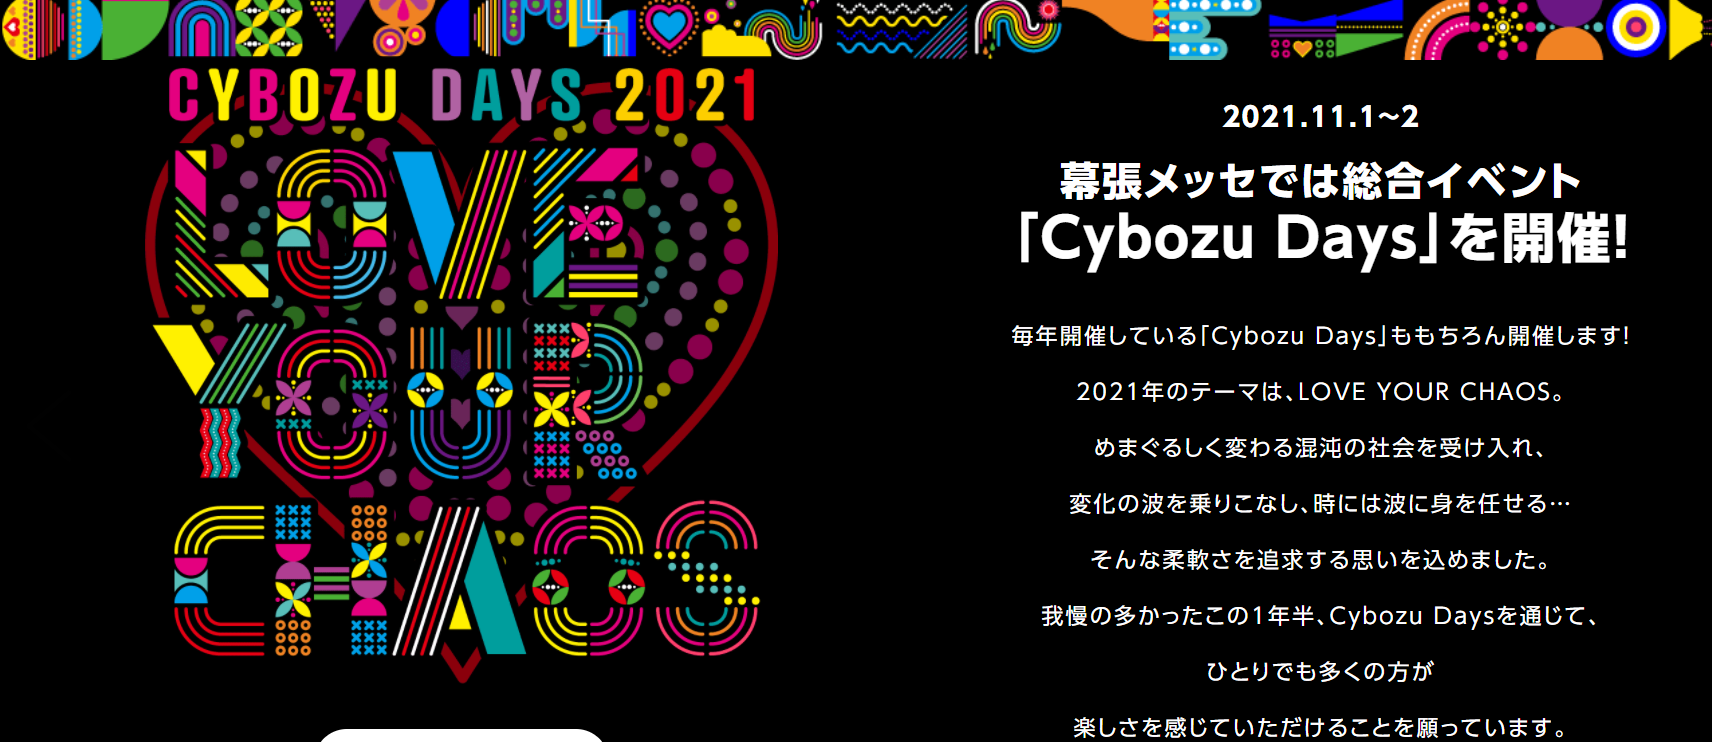 CybozuDayz(サイボウズデイズ)2021に今年も出展します